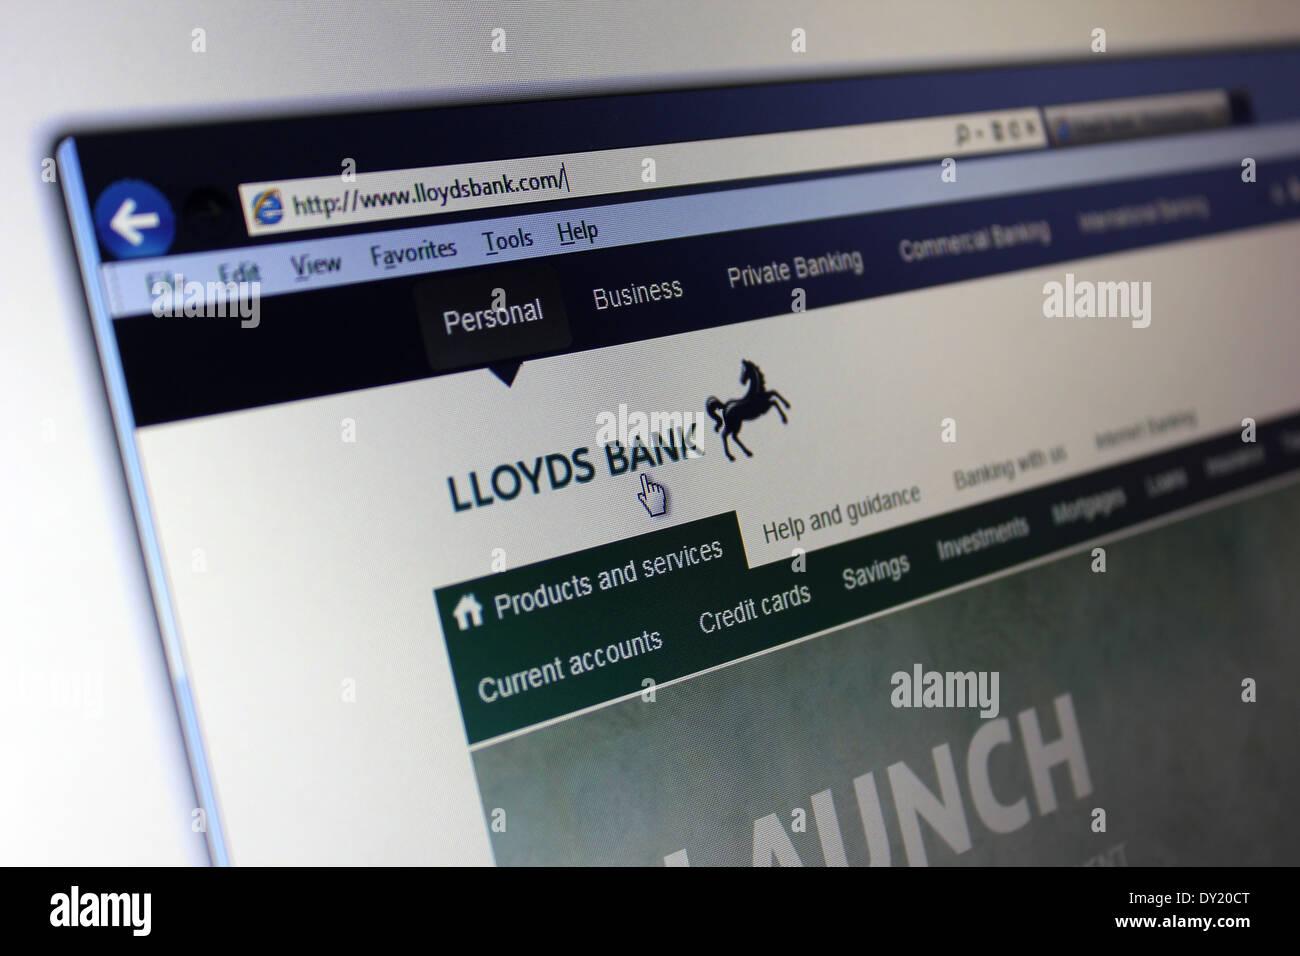 Lloyds Bank Website Stock Photos & Lloyds Bank Website Stock Images ...